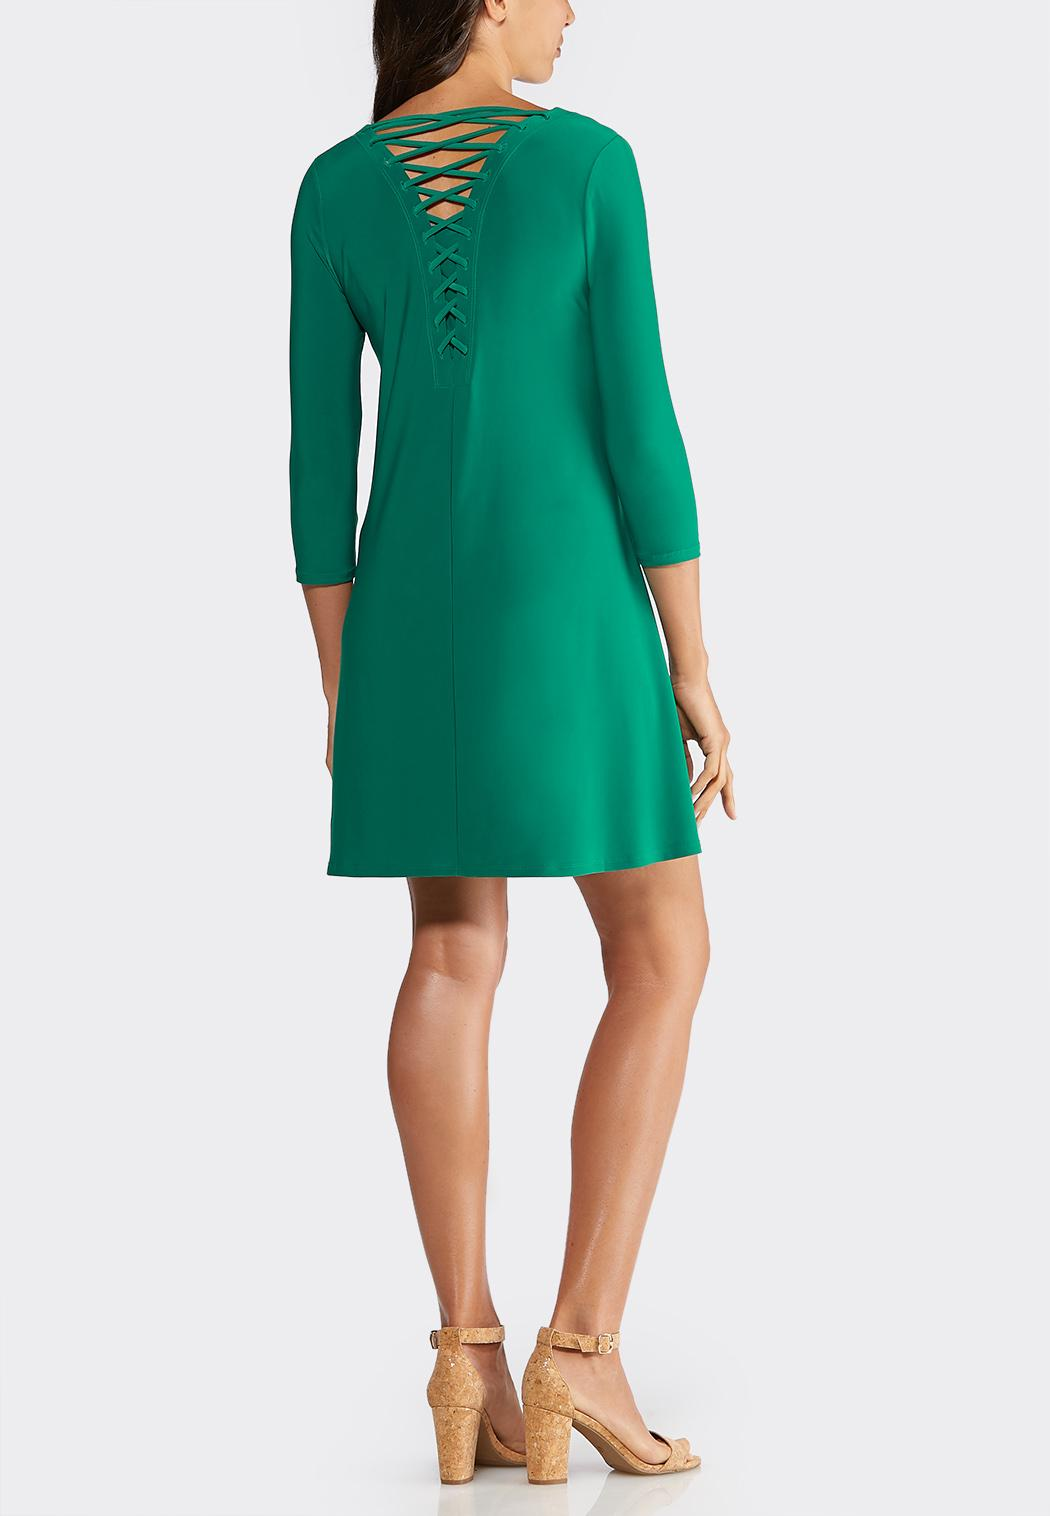 Plus Size Strappy Back Swing Dress (Item #43933169)